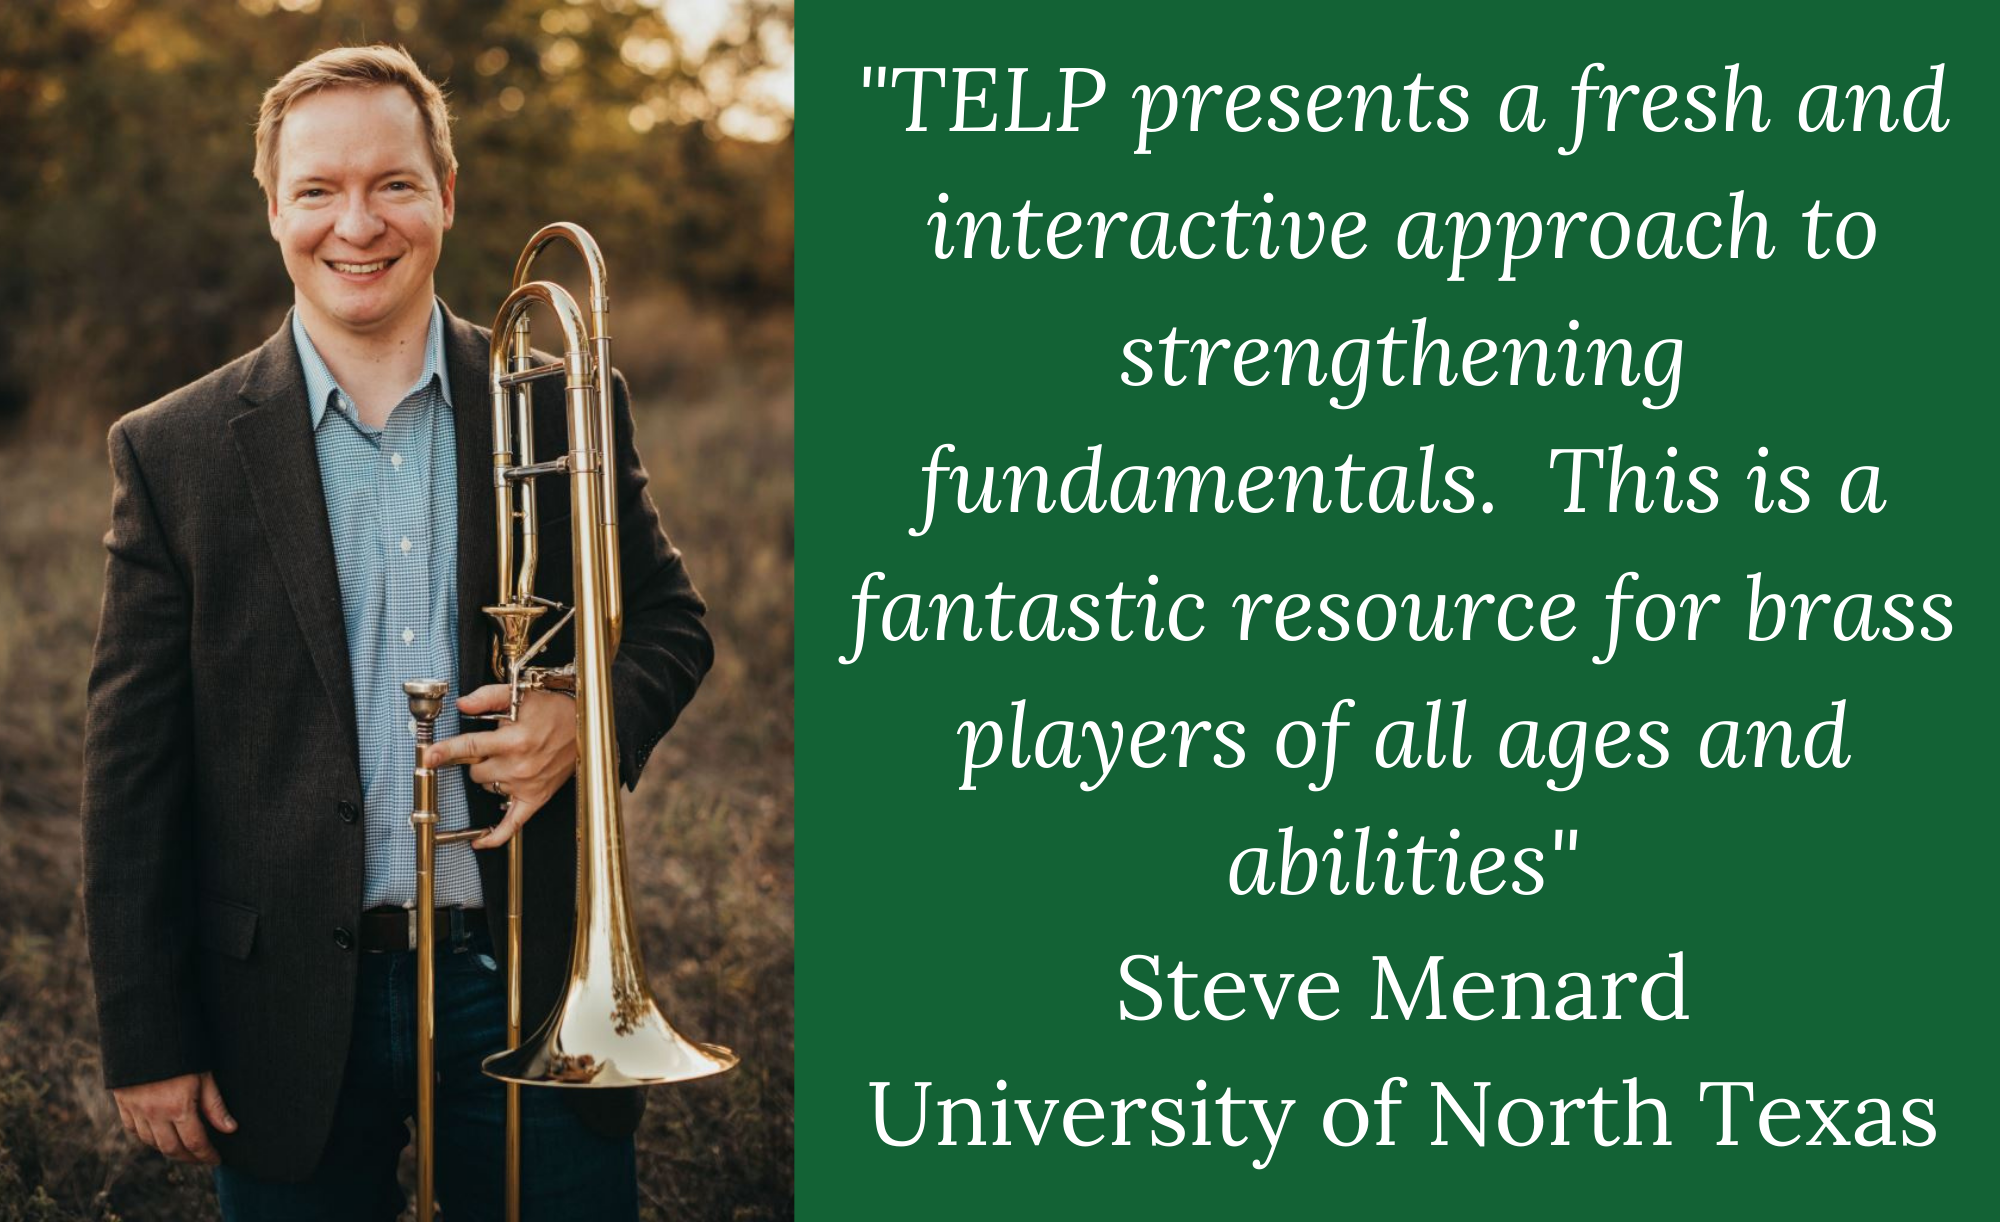 Steve Menard